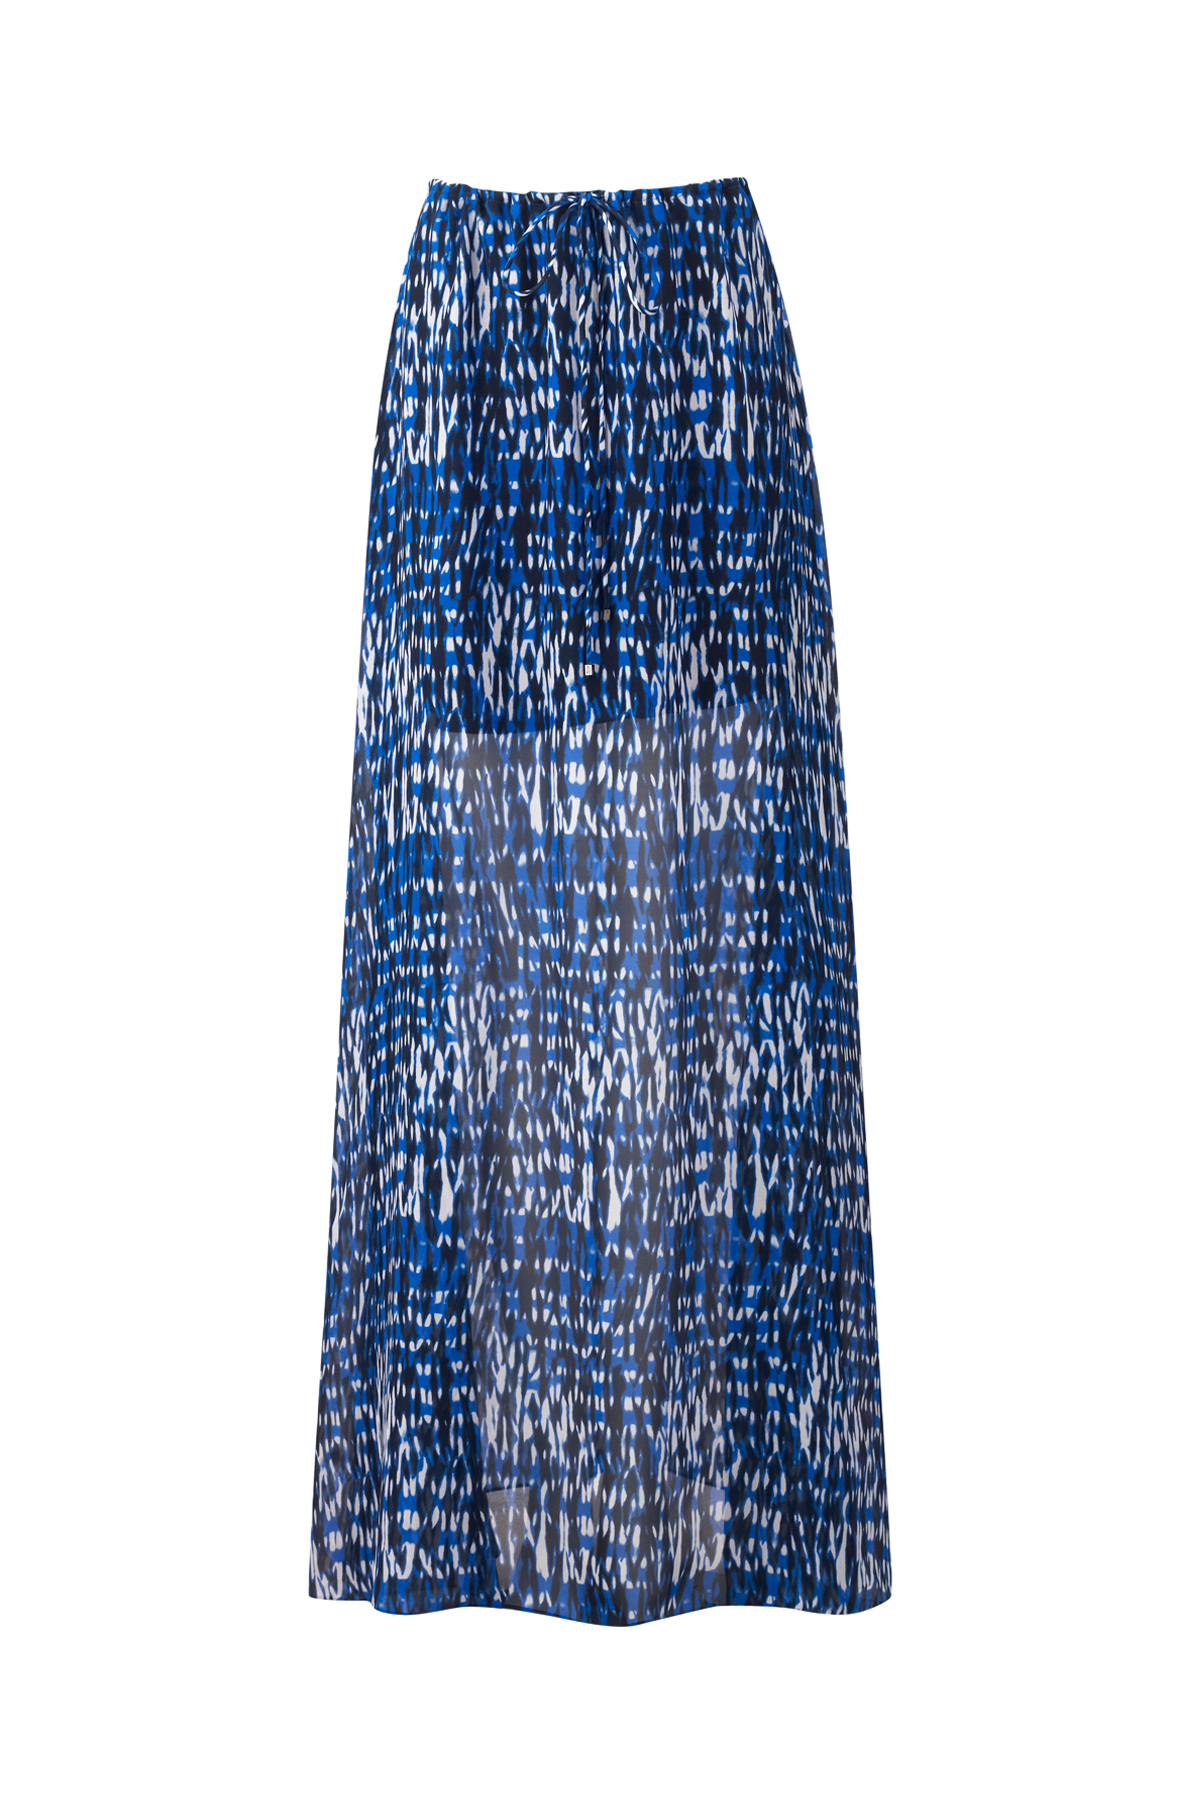 amanda wakeley blue ford silk ripple skirt lyst